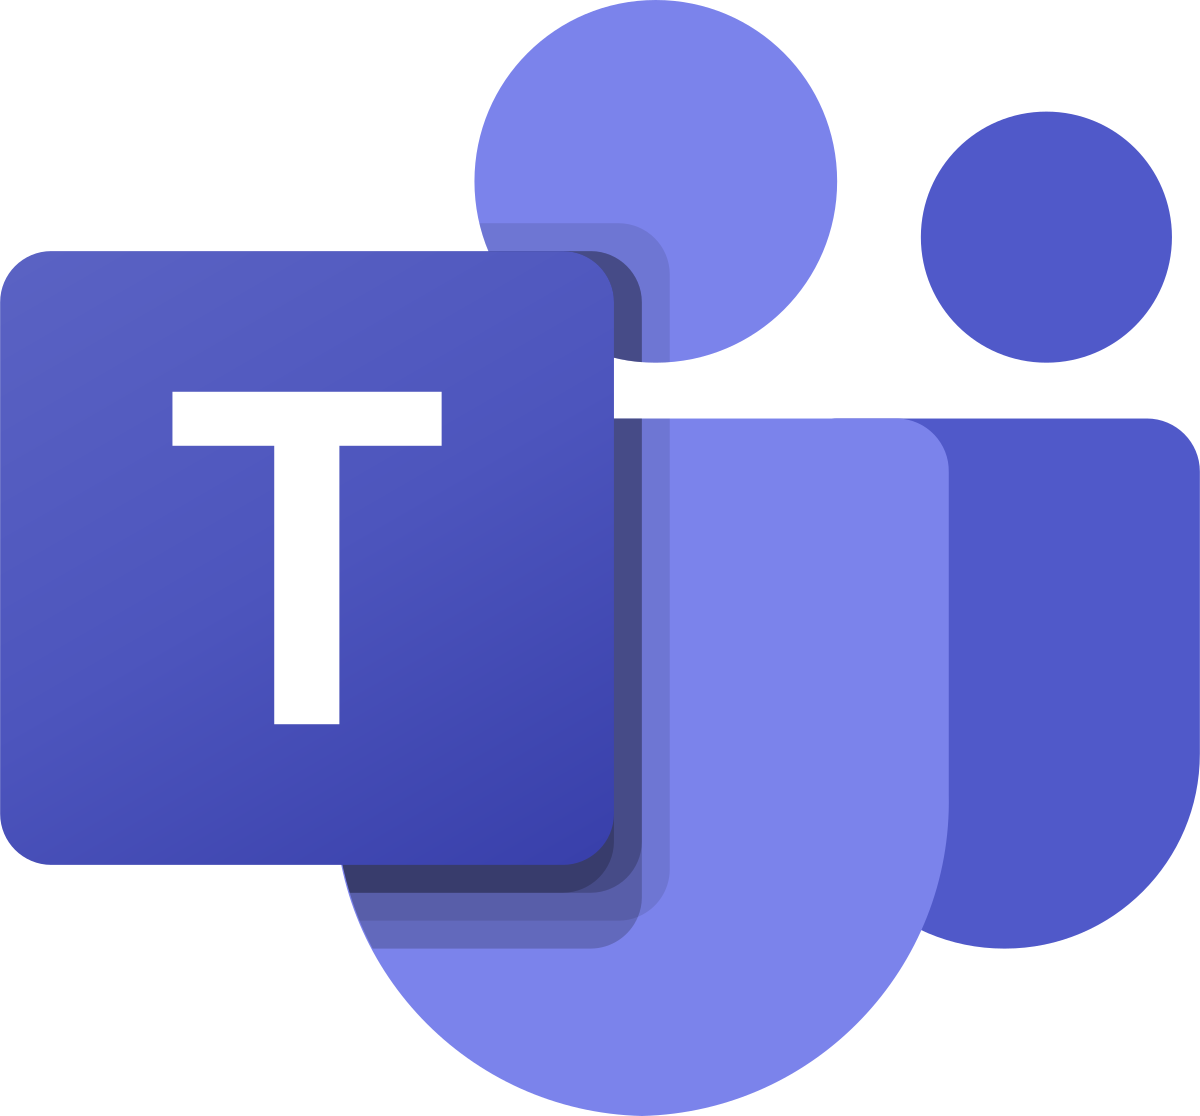 Microsoft Teams chat icon